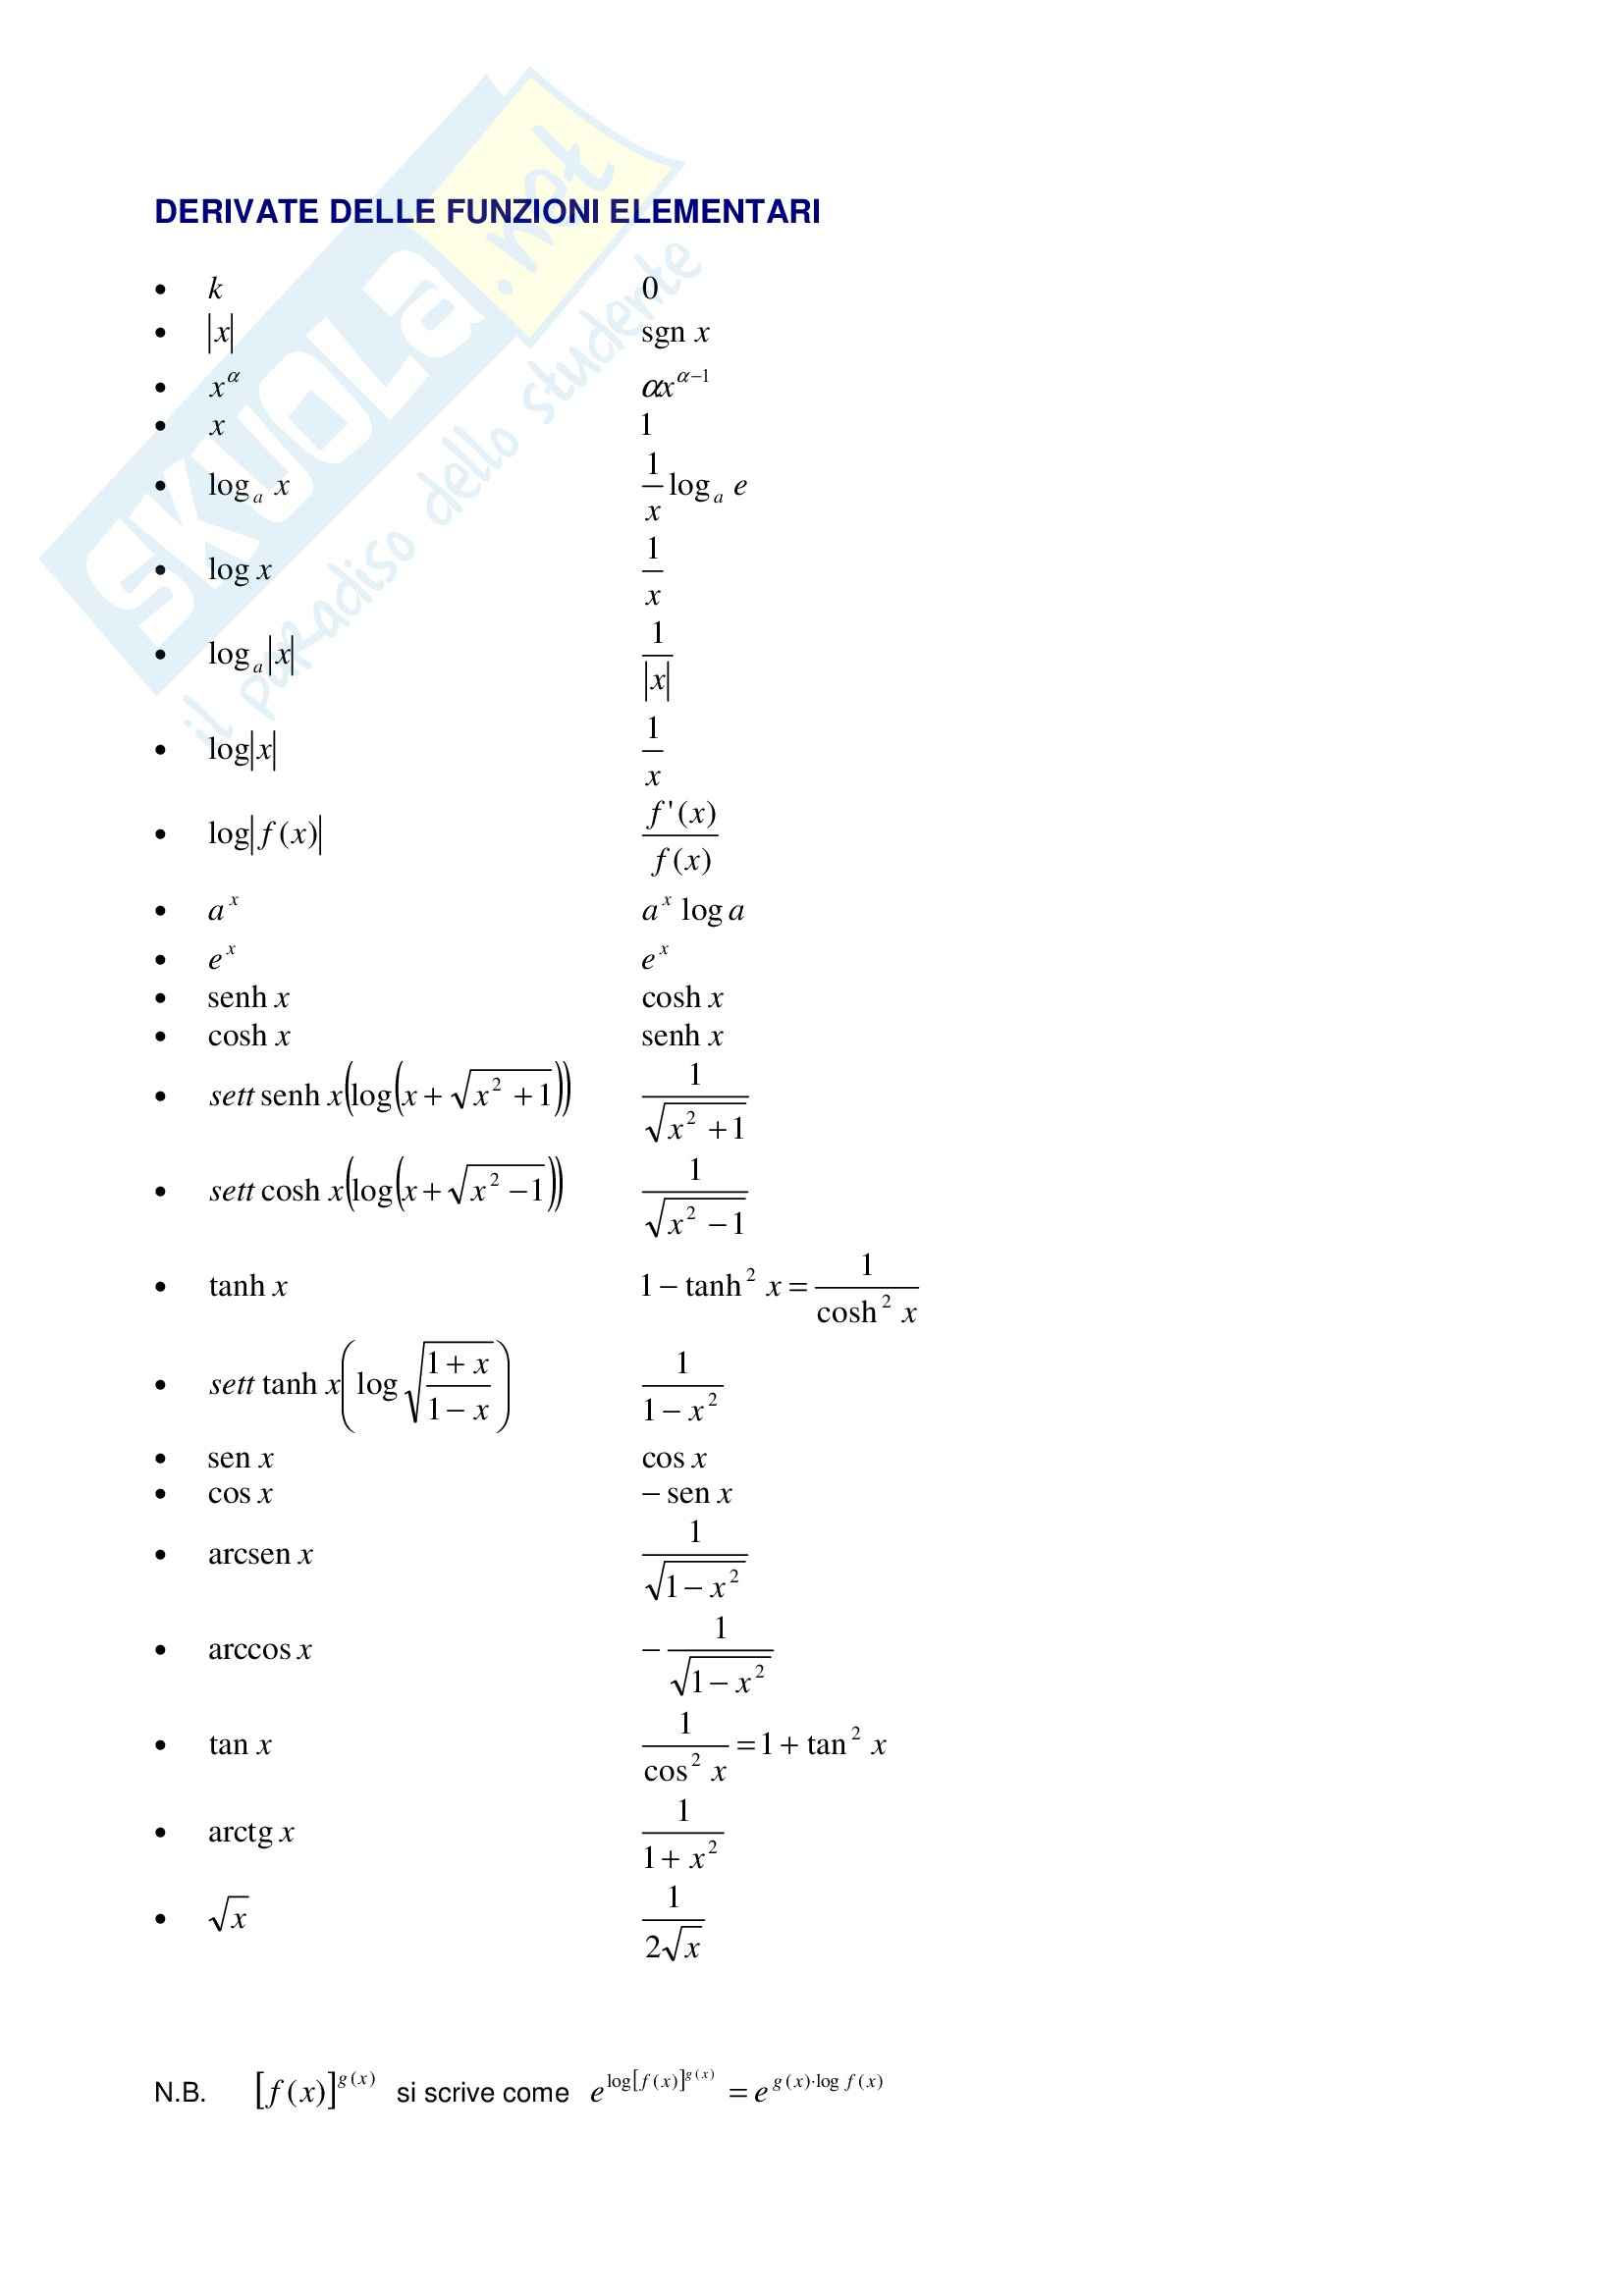 appunto L. Rossi Analisi matematica I